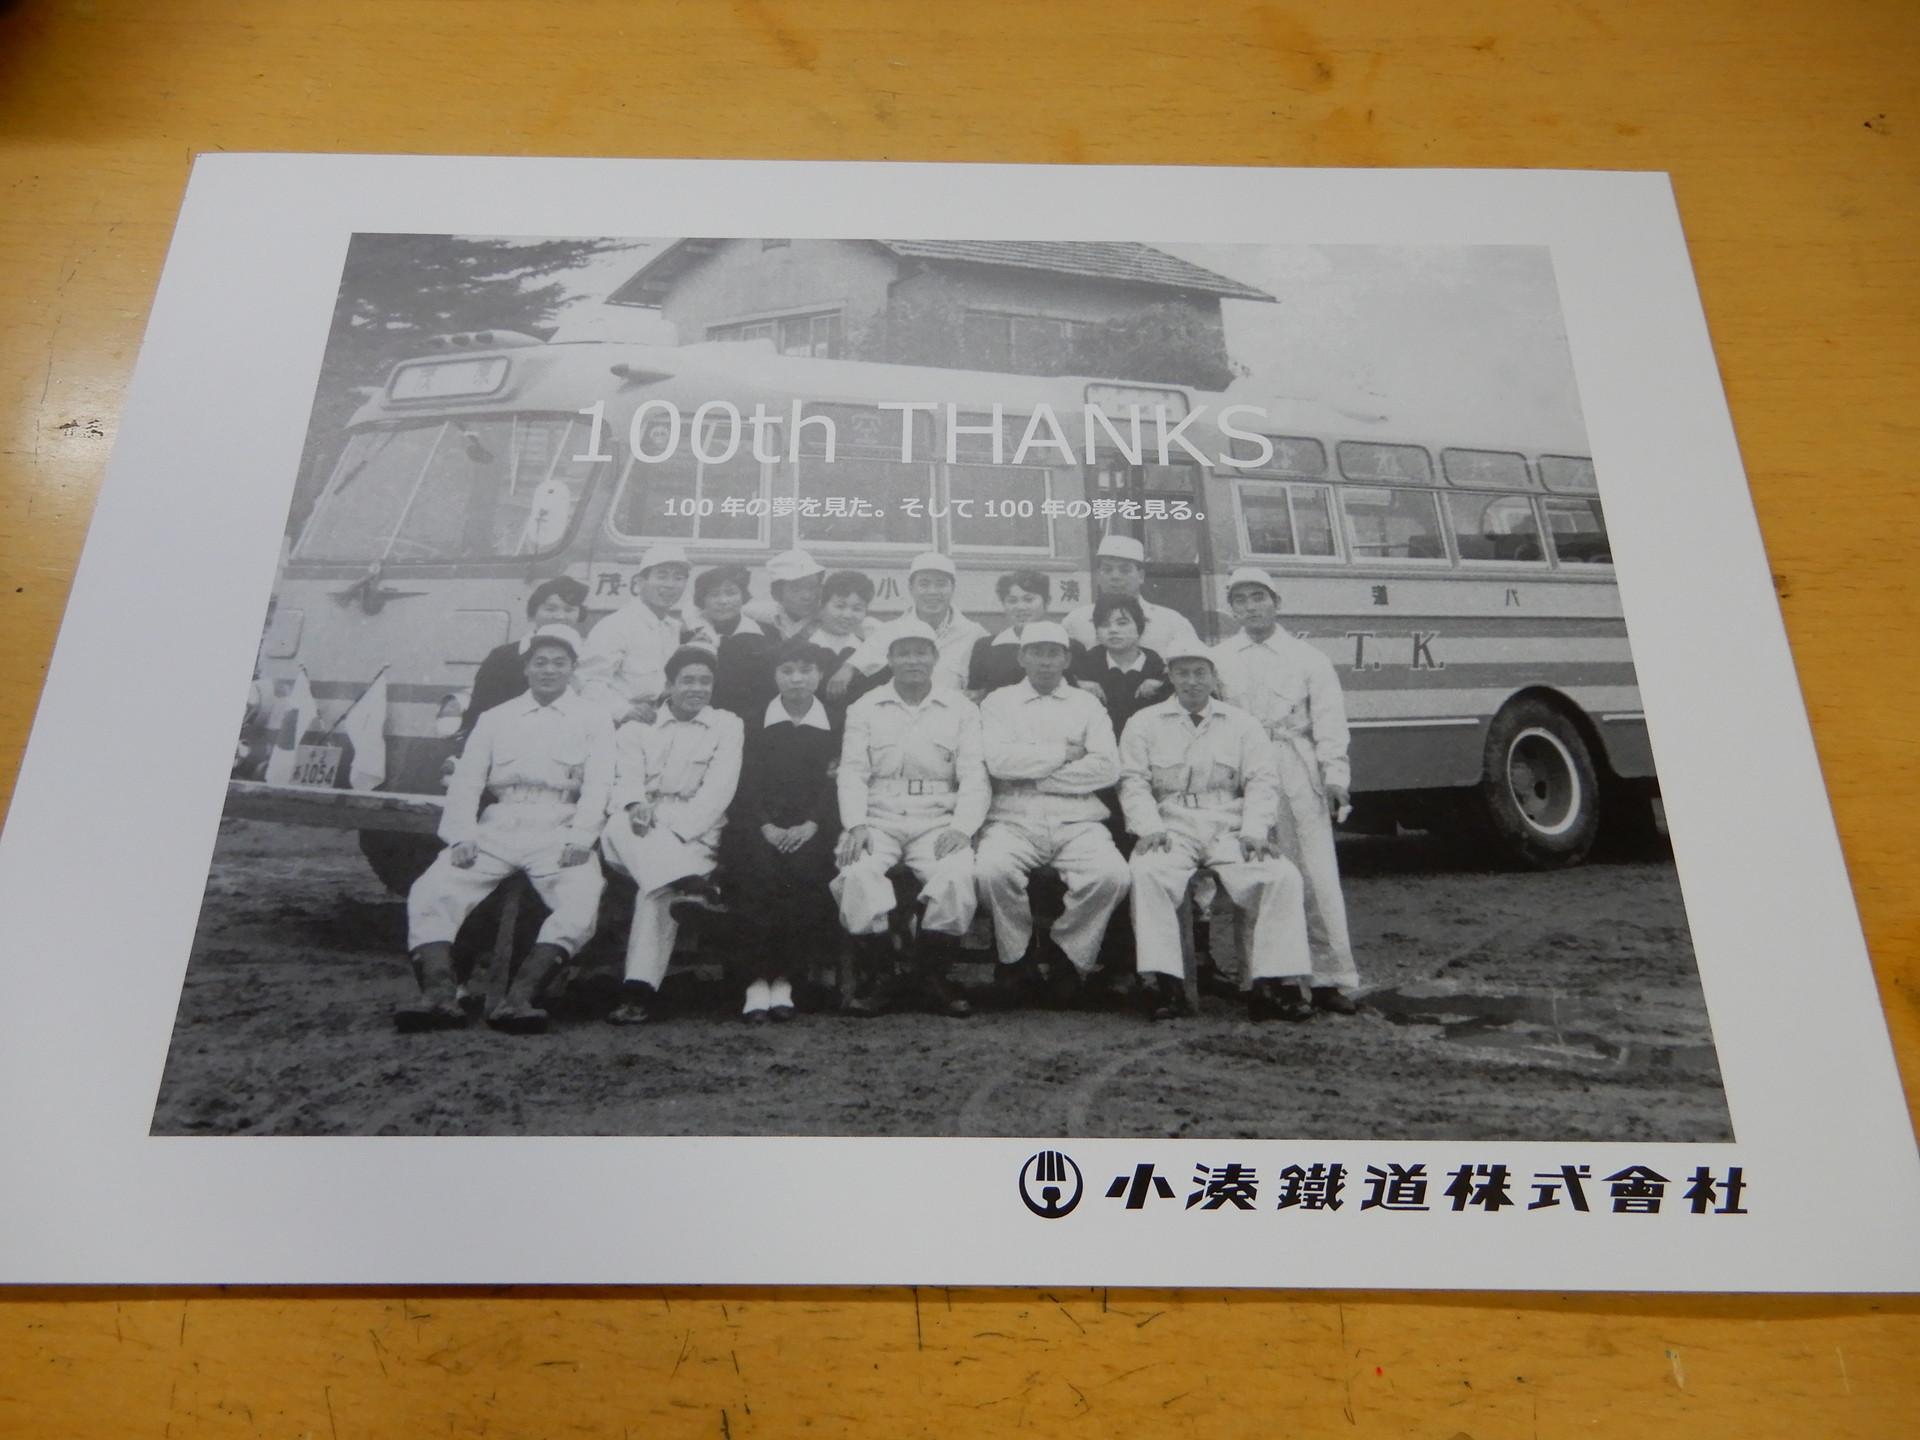 小湊鐡道100年誌の裏表紙